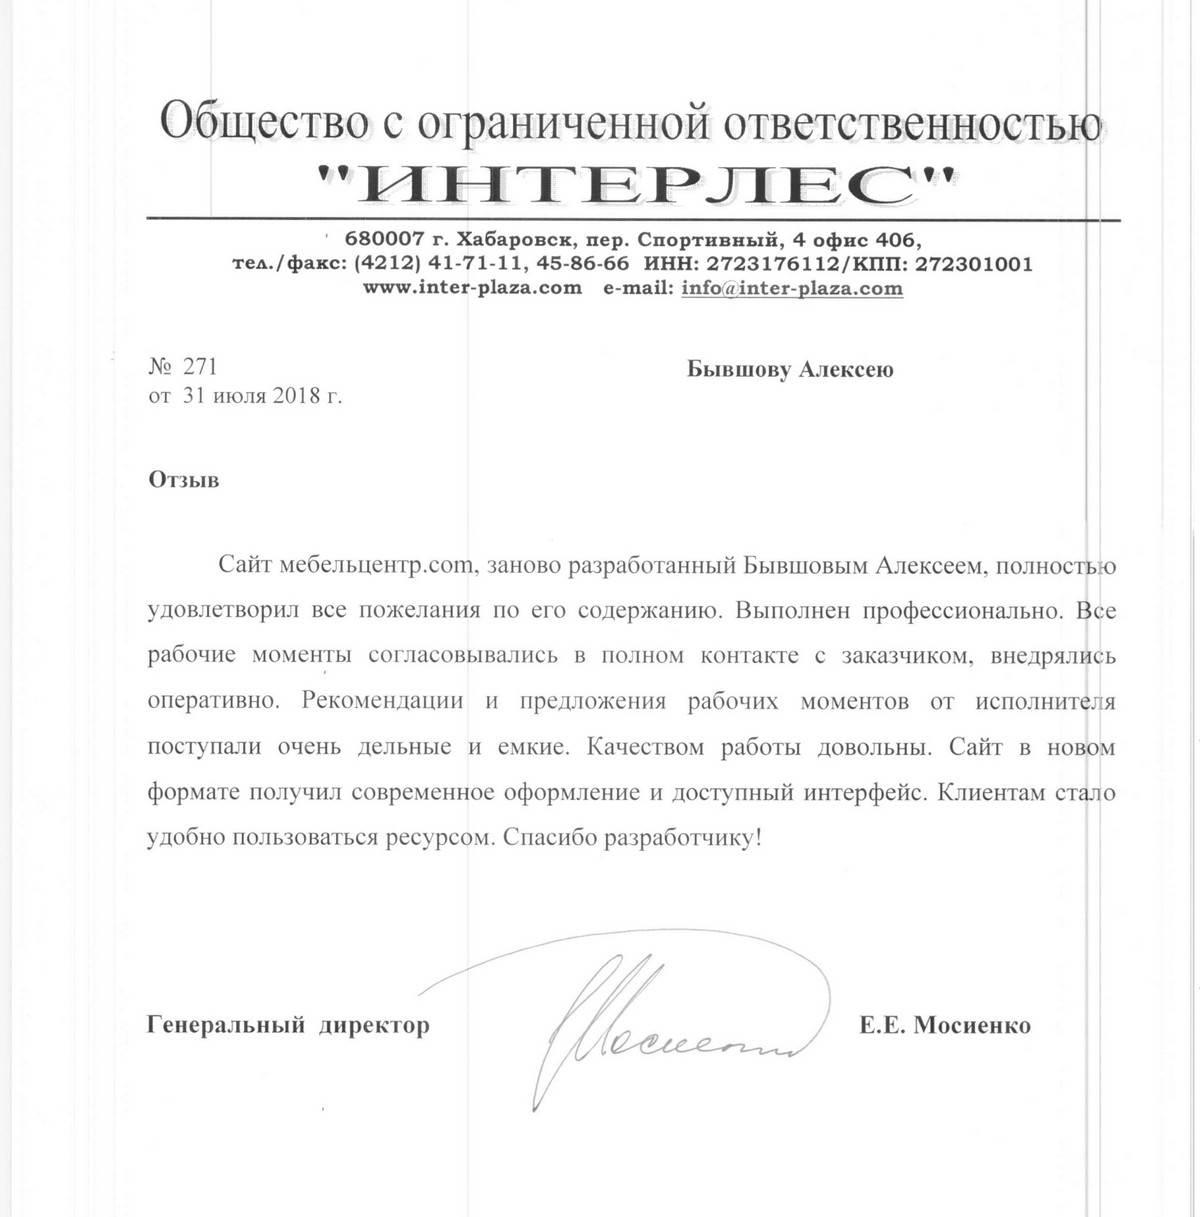 Мосиенко Егор Евгеньевич